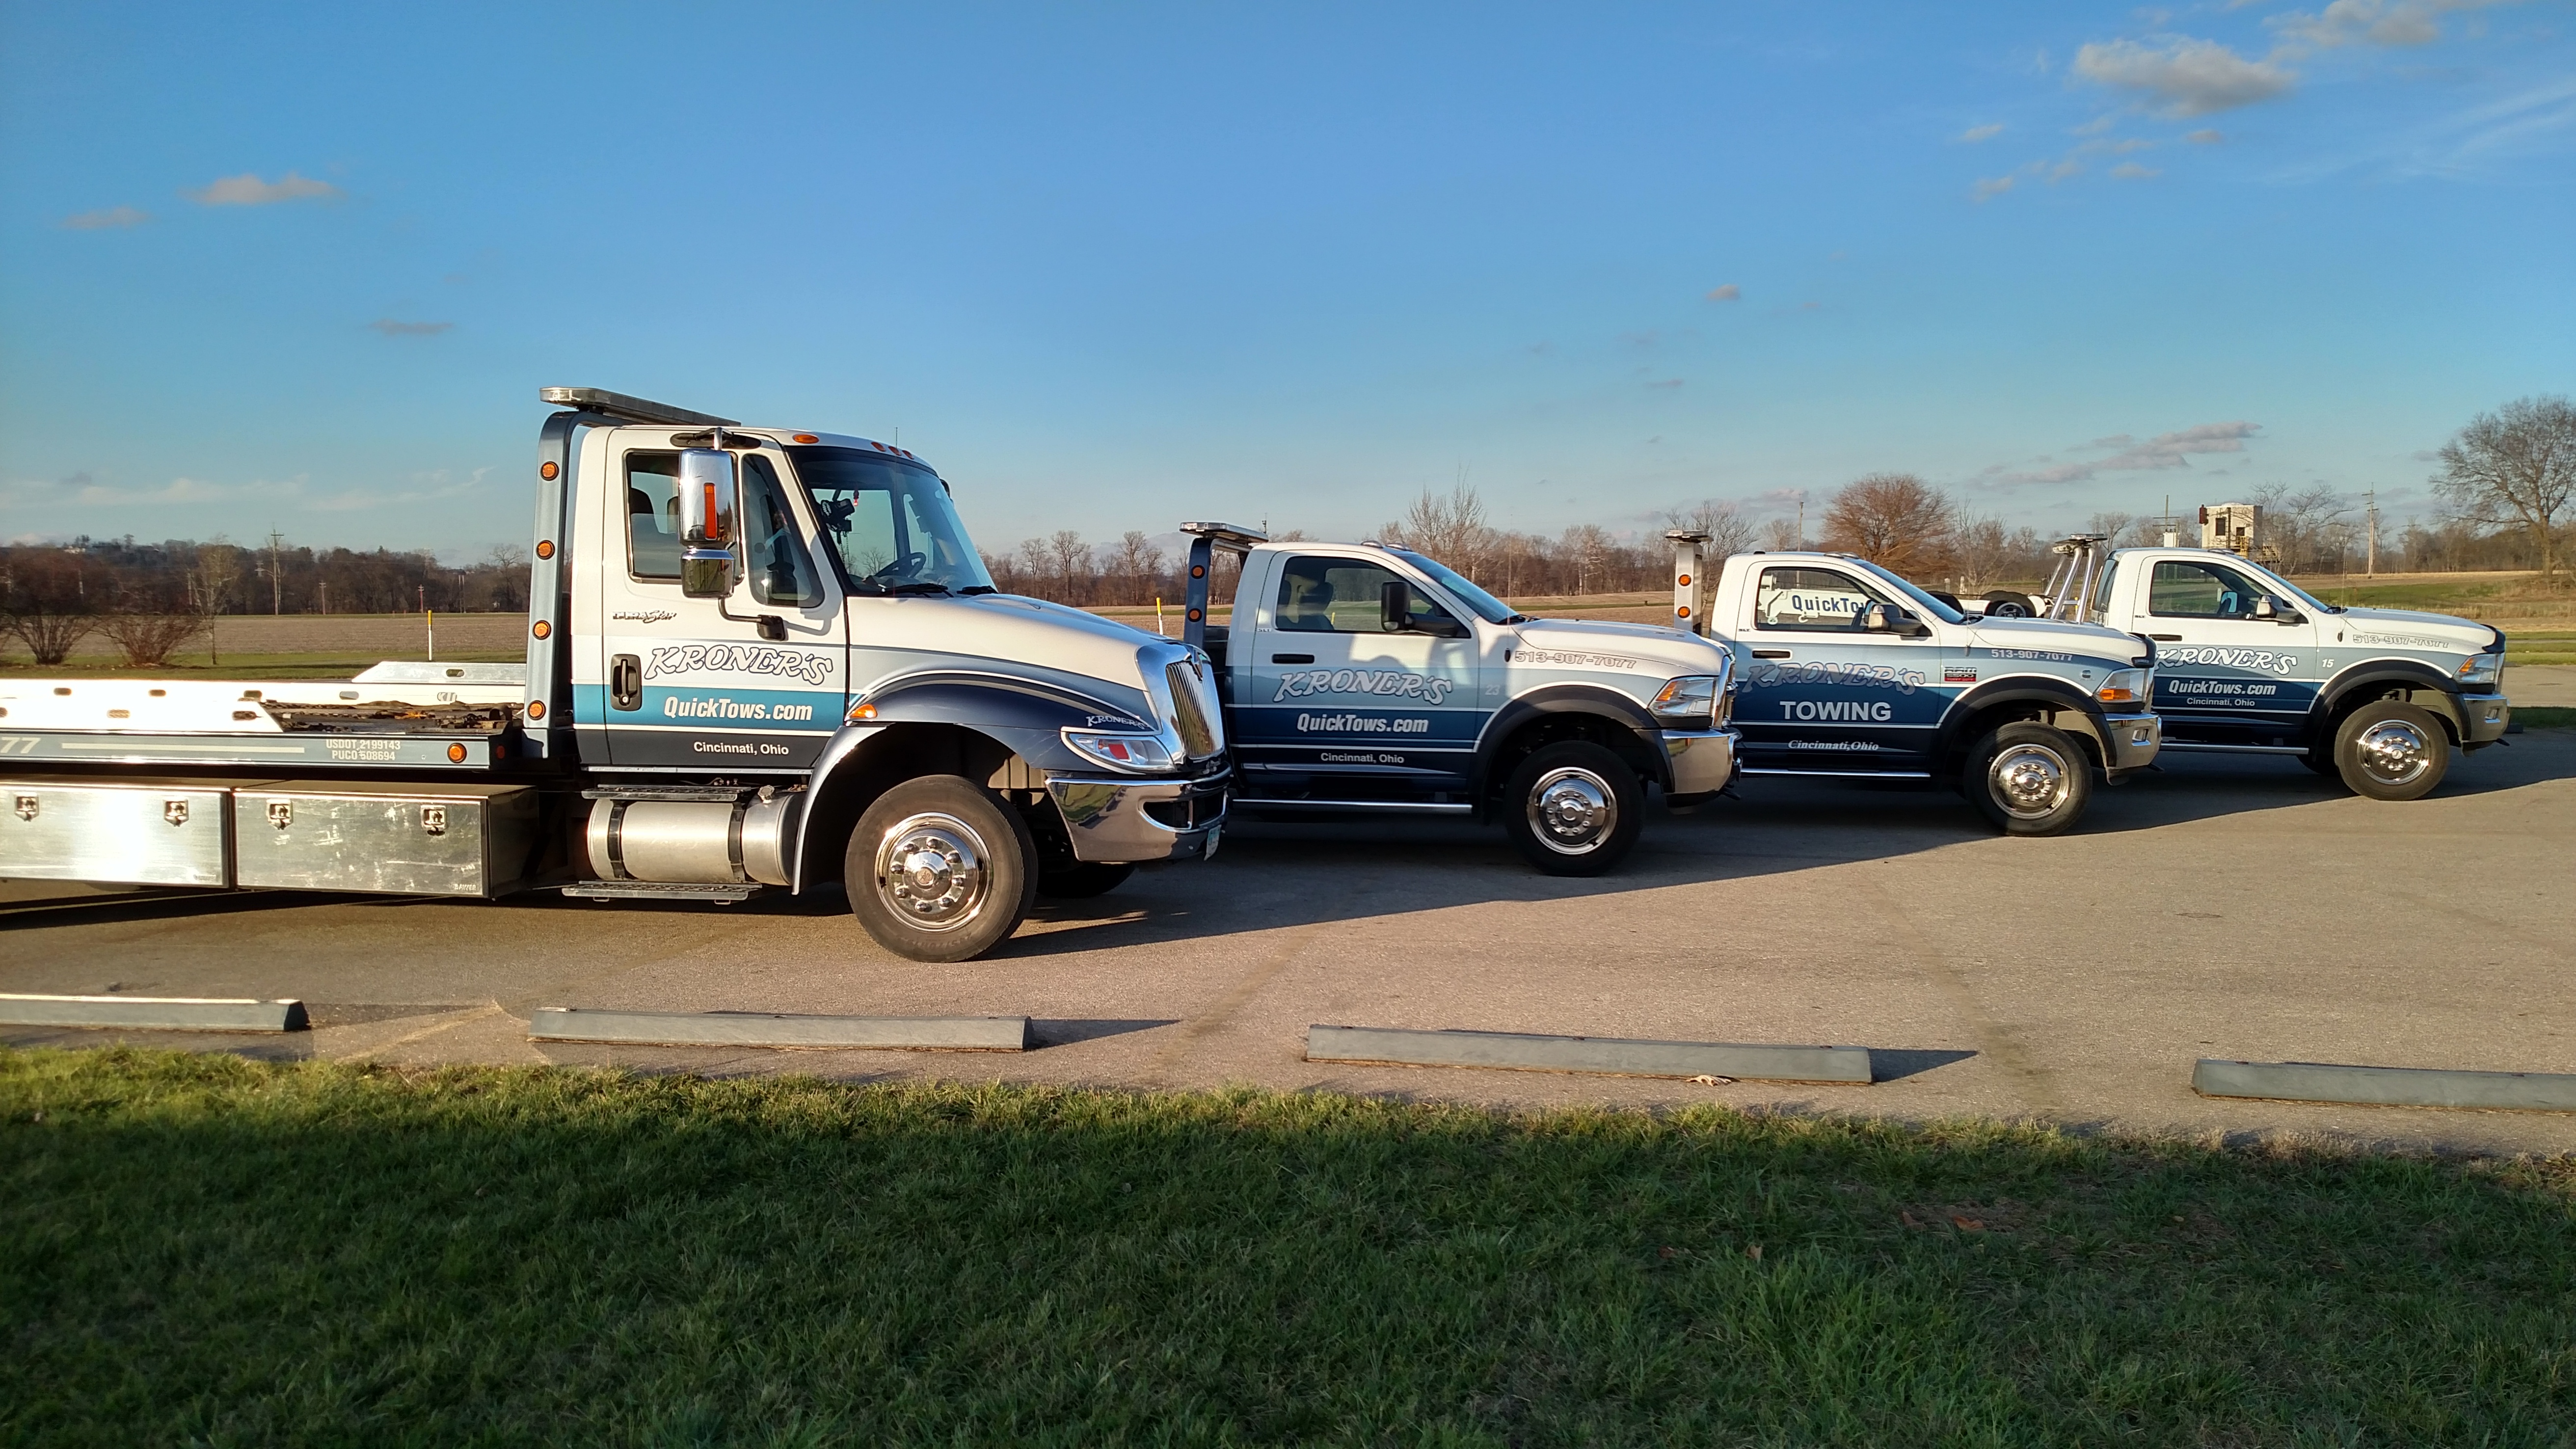 Roadside Assistance trucks in Cincinnati Ohio